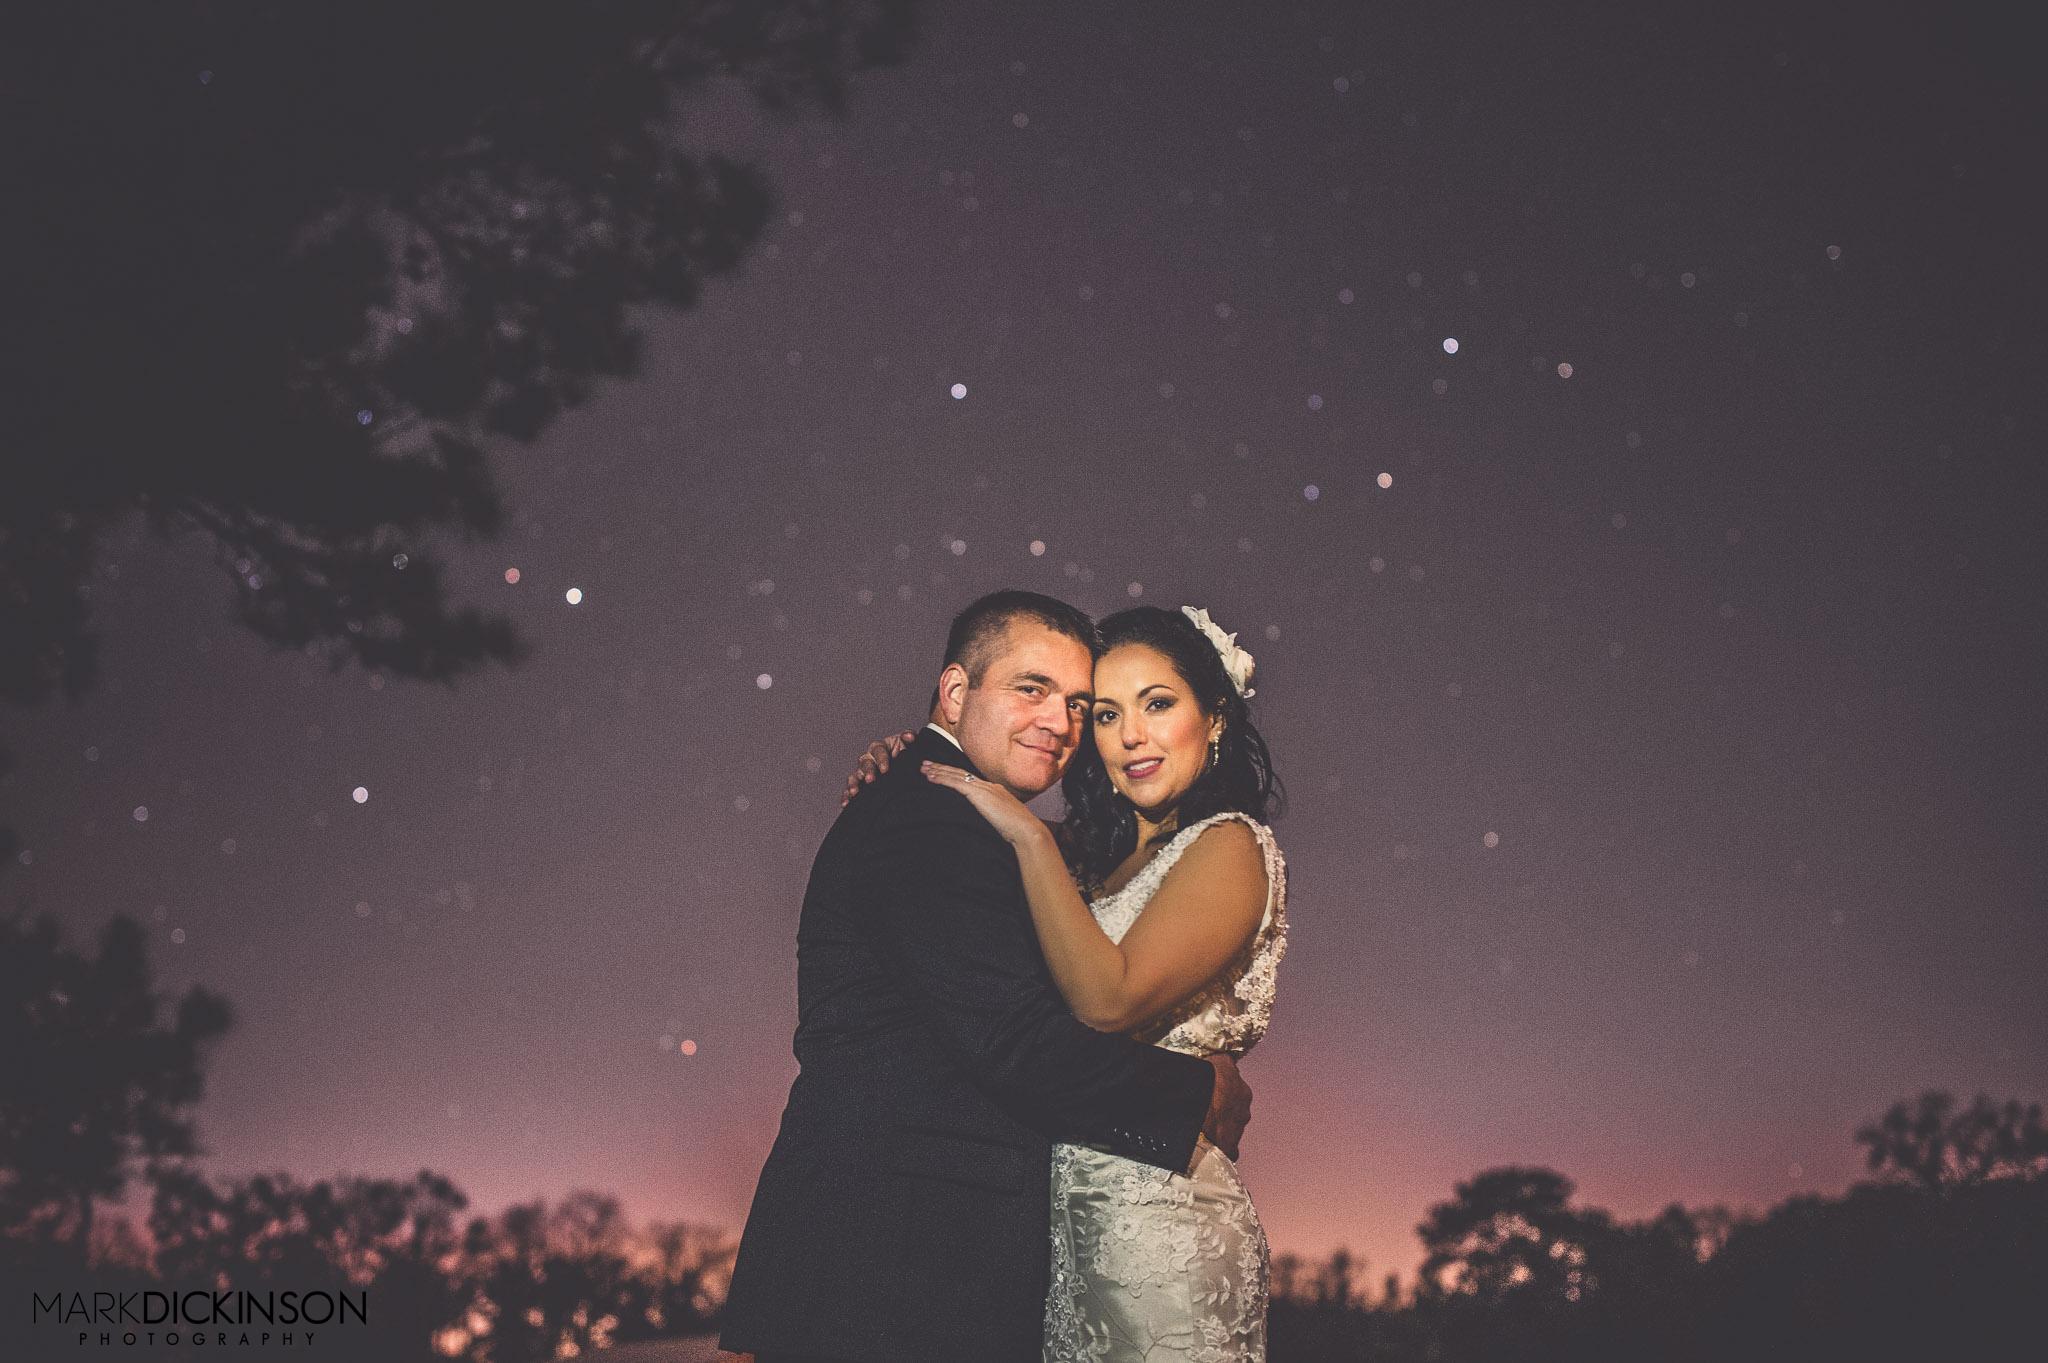 Central Florida night Photographer